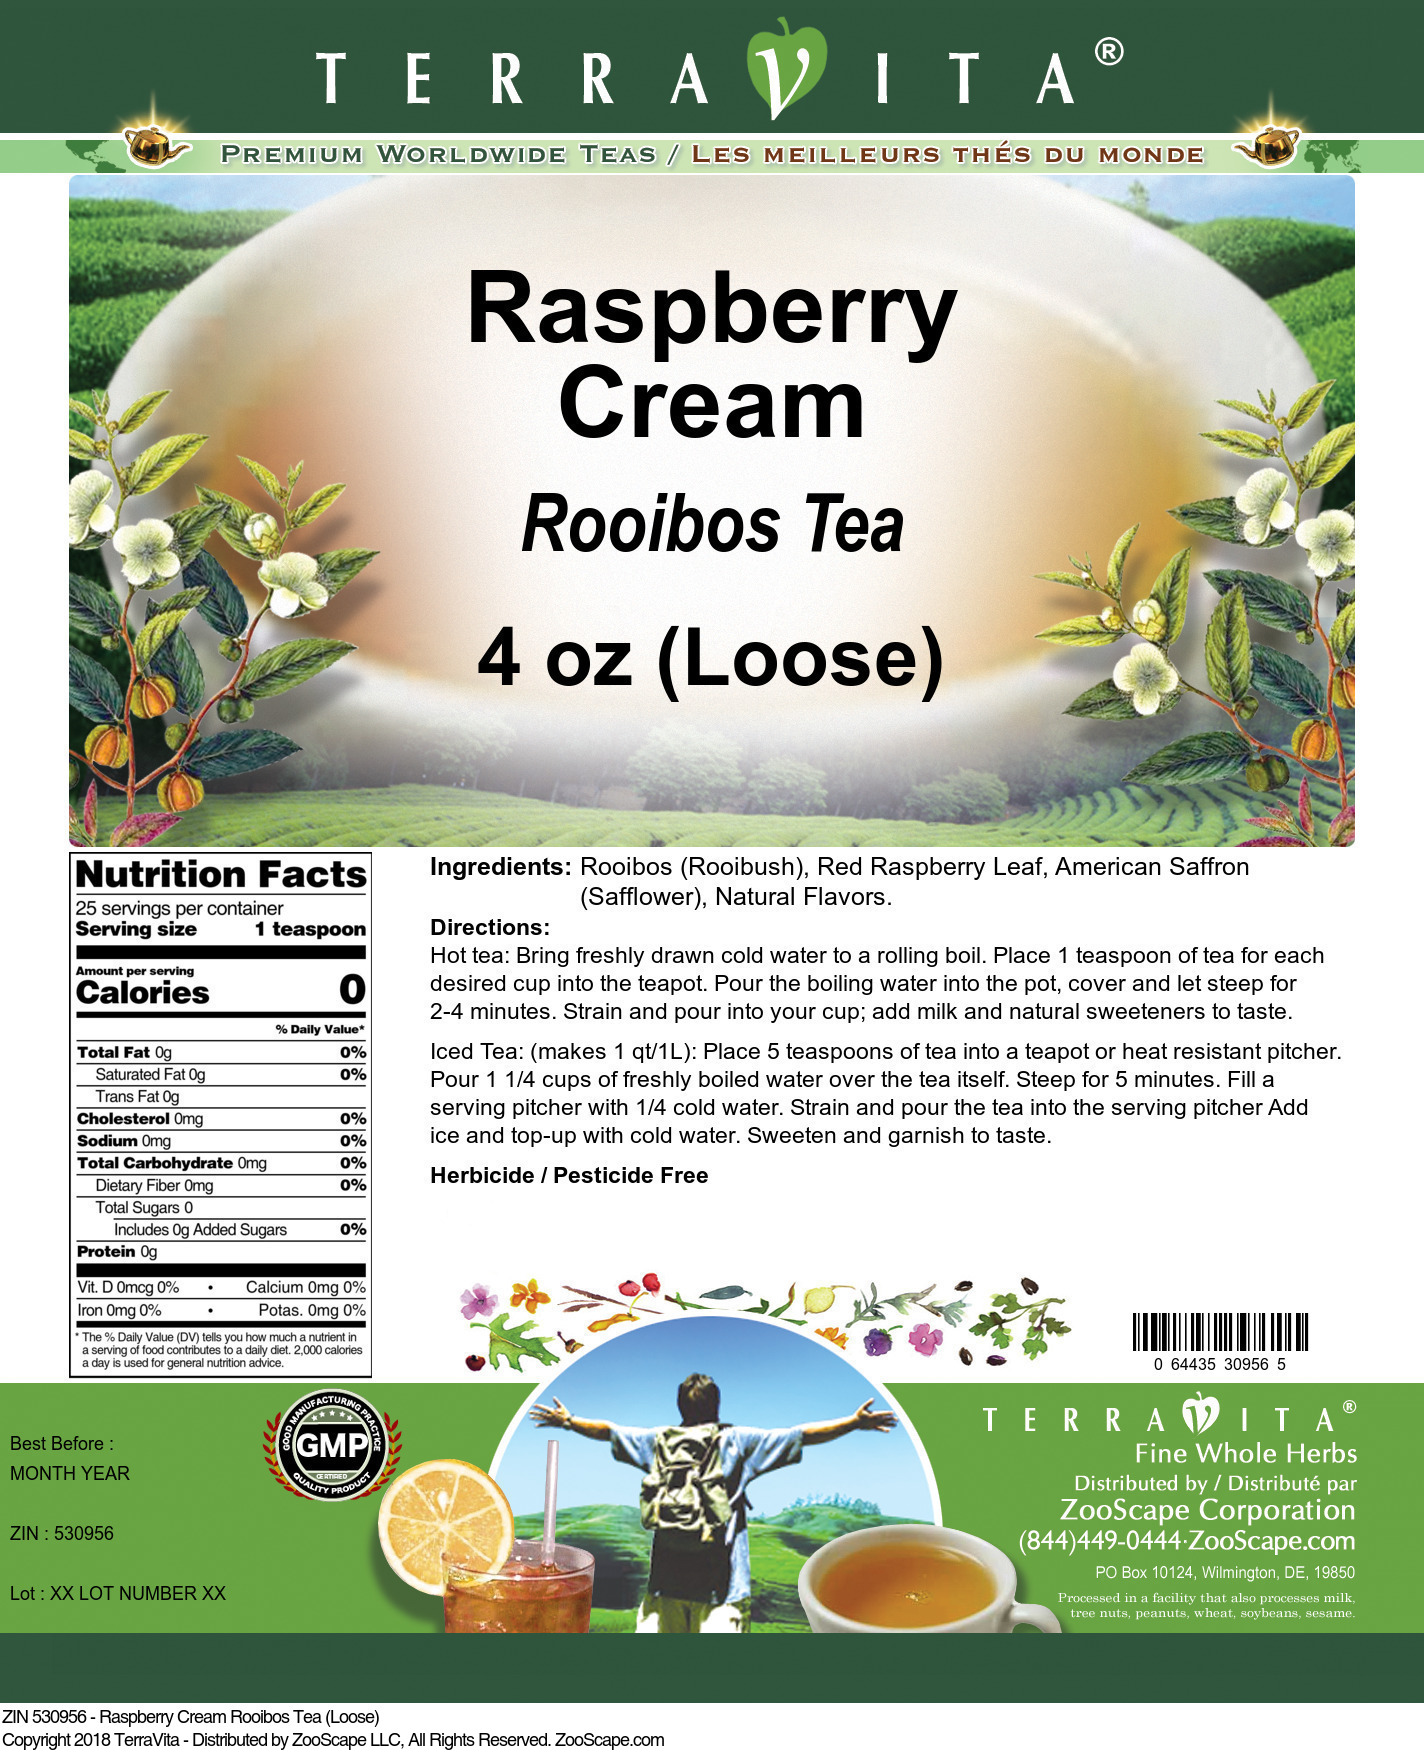 Raspberry Cream Rooibos Tea